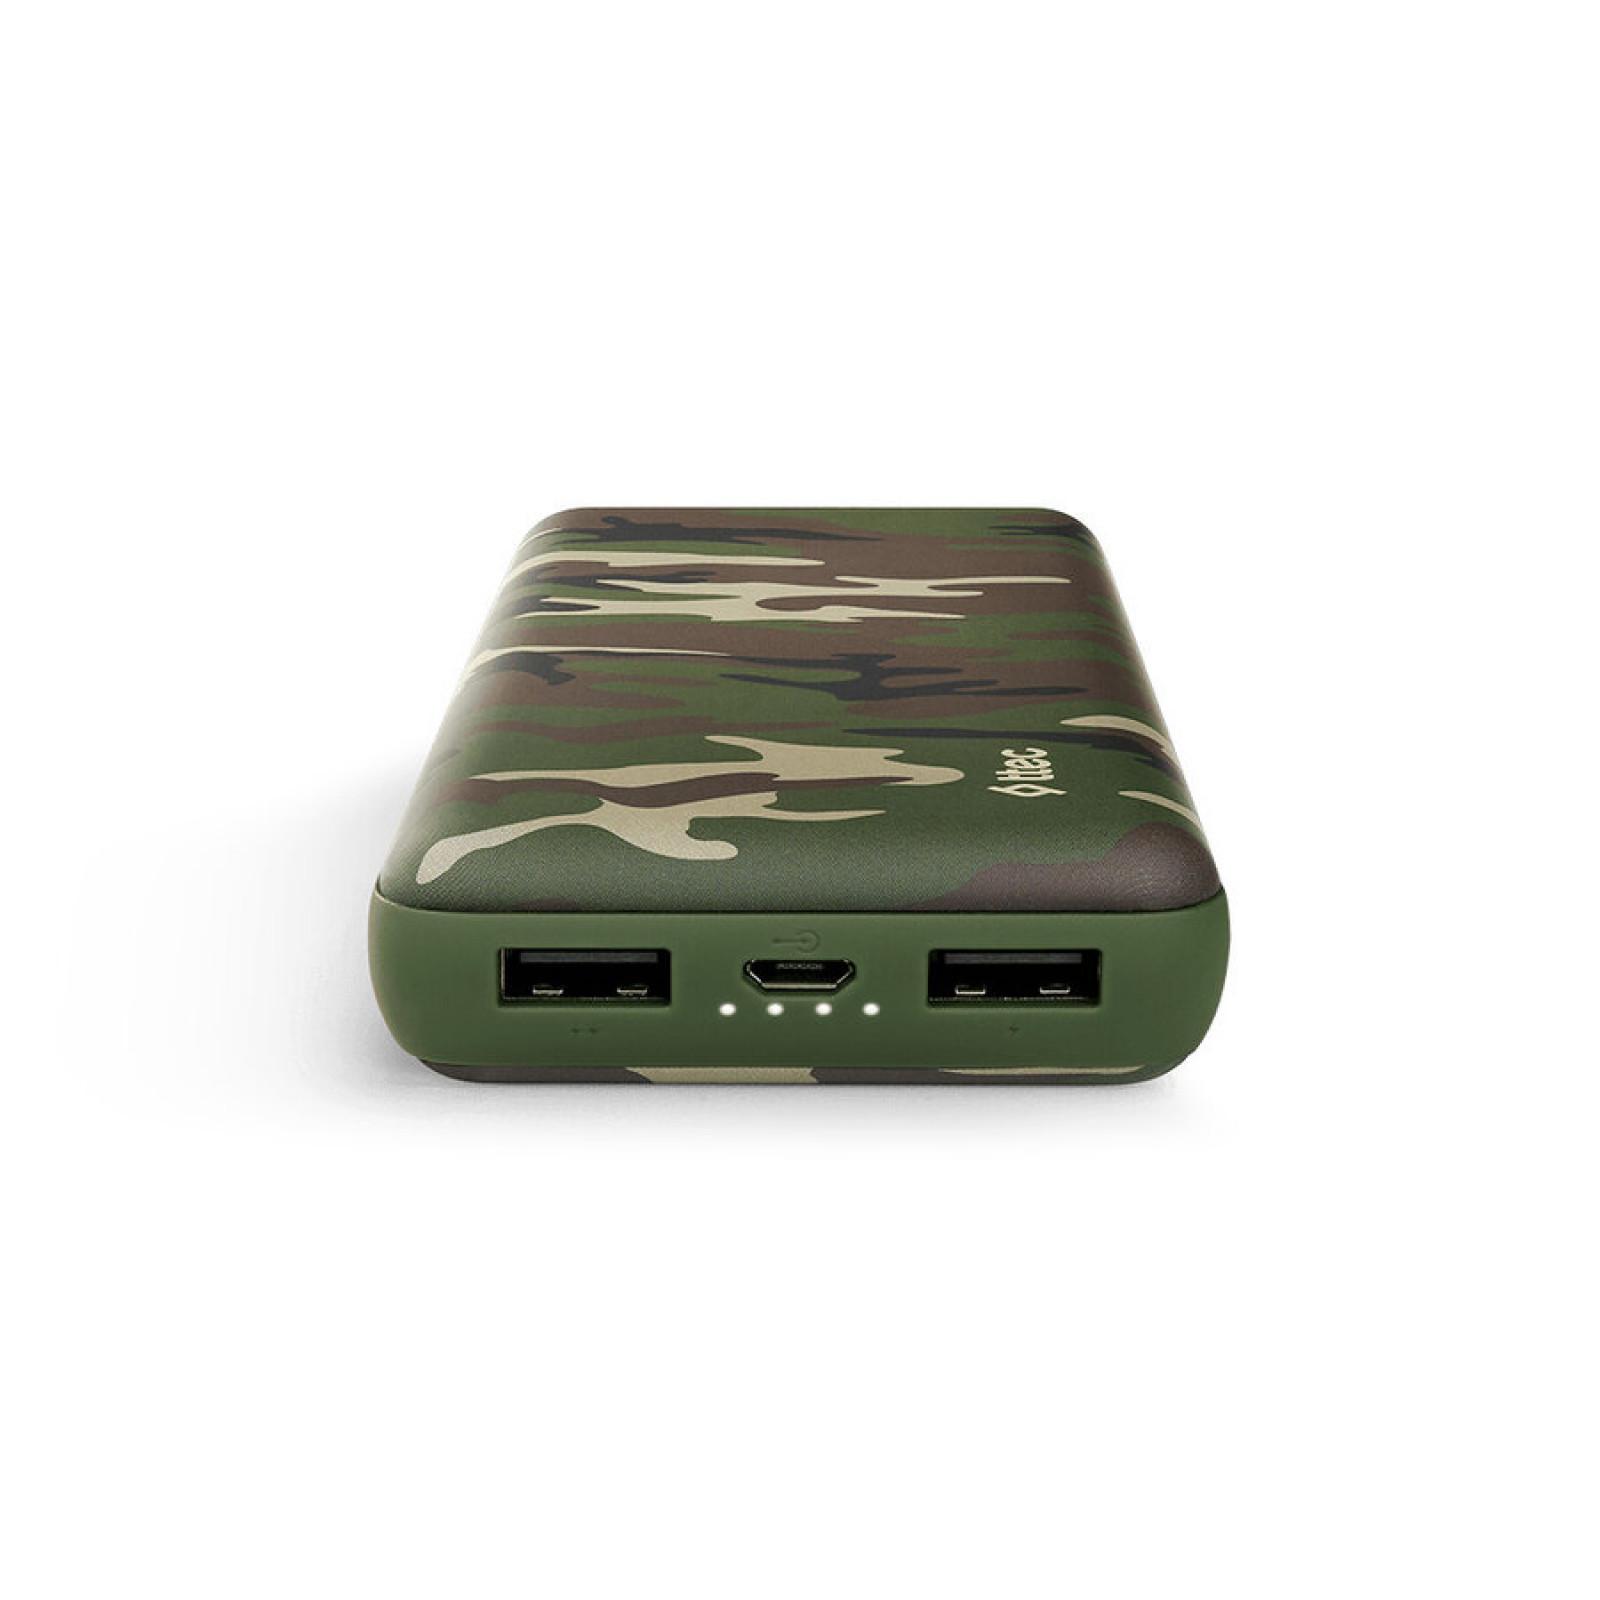 Външна батерия ReCharger 20.000mAh Universal Mobile Charger - Green Camouflage, 118093